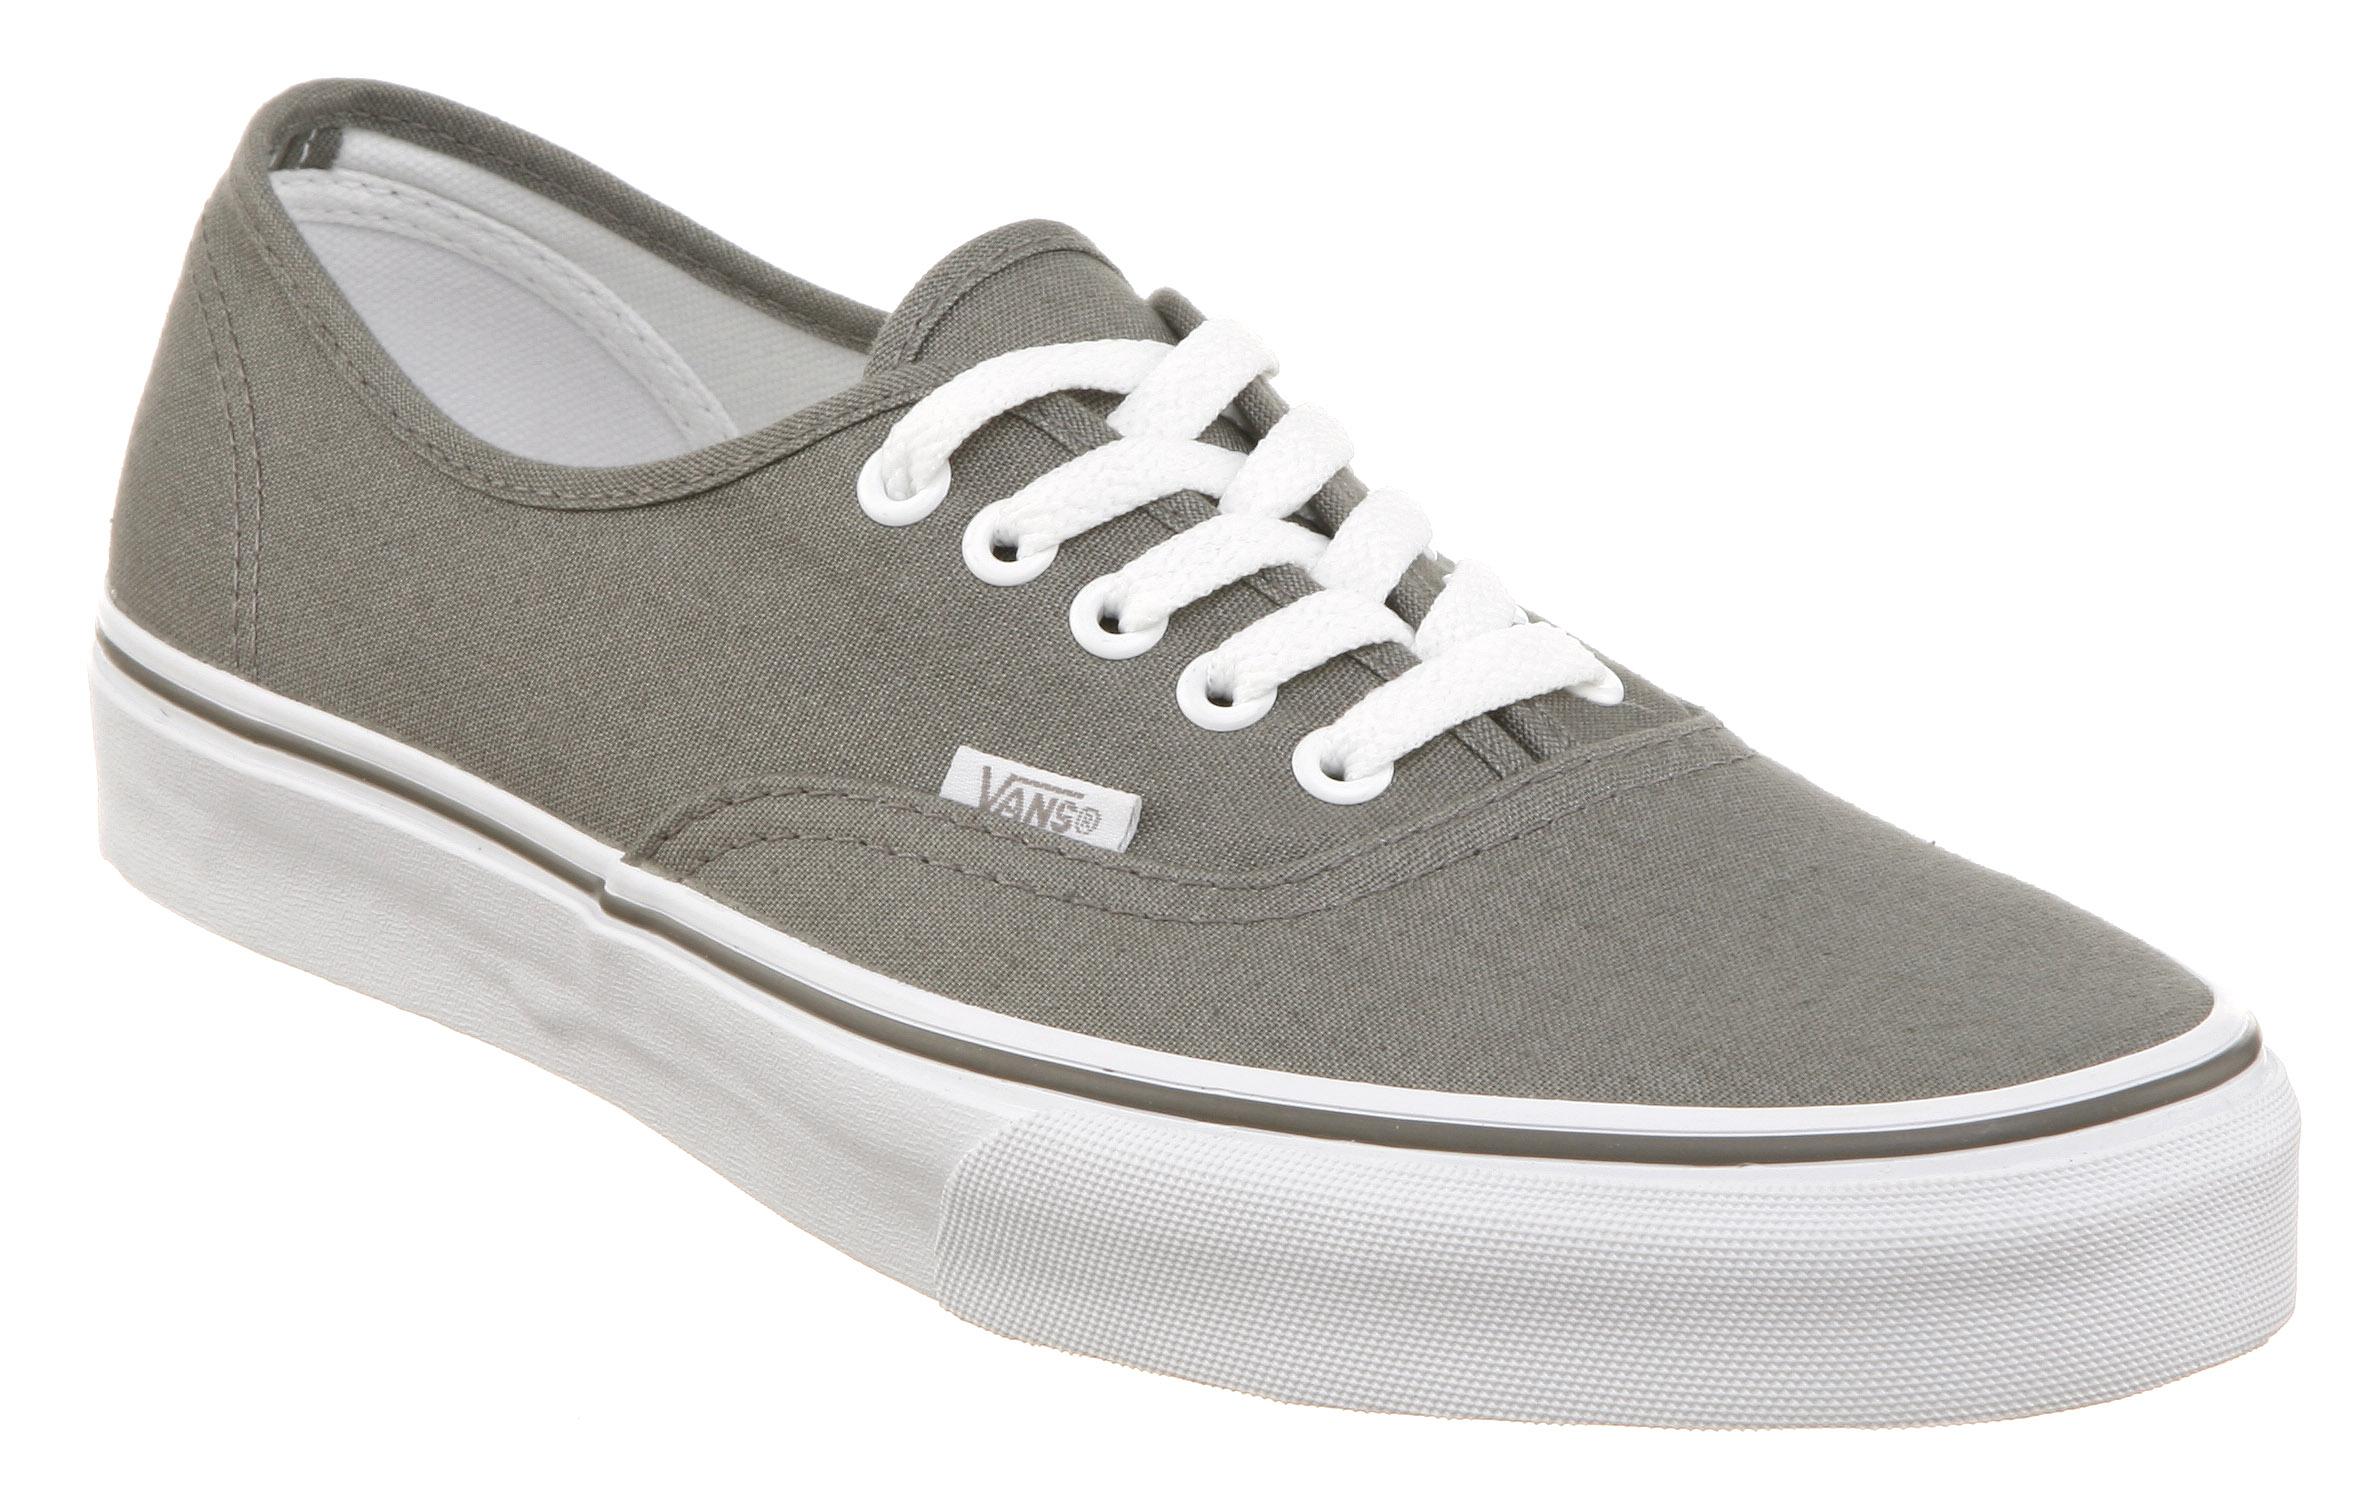 Vans-Authentic-Grey-Exclusive-Trainers-Shoes